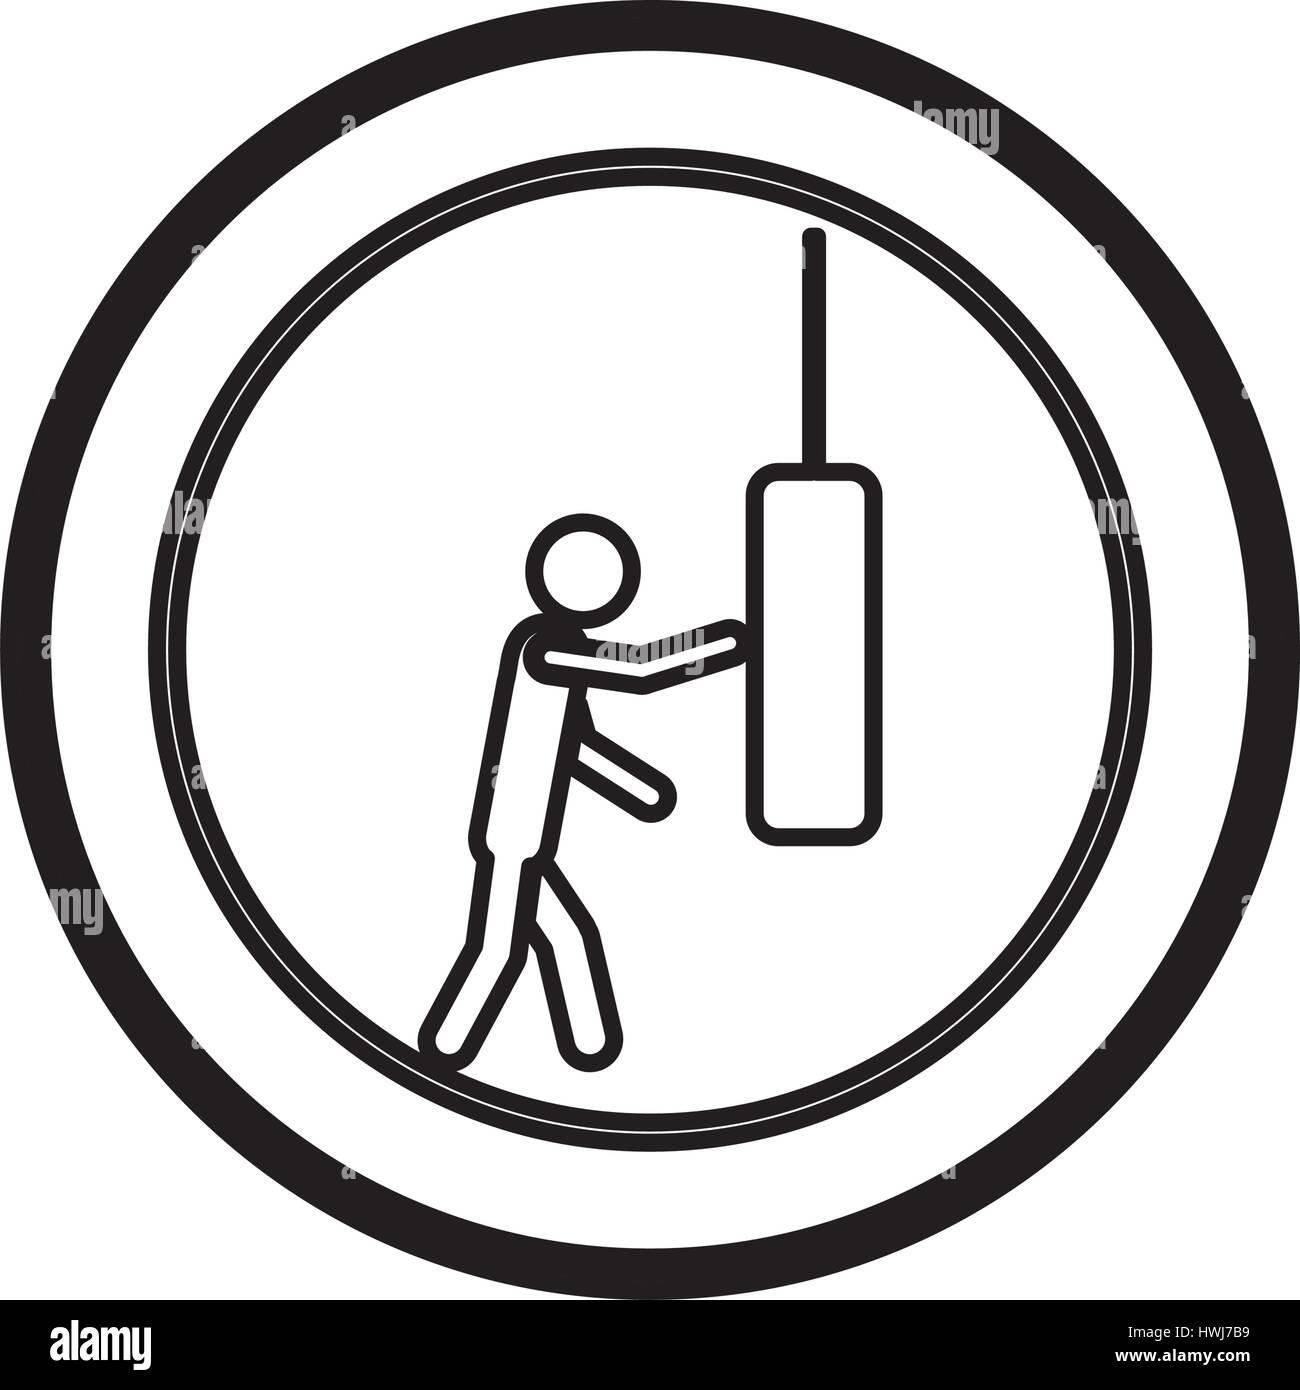 symbol person knocking punching bag - Stock Vector